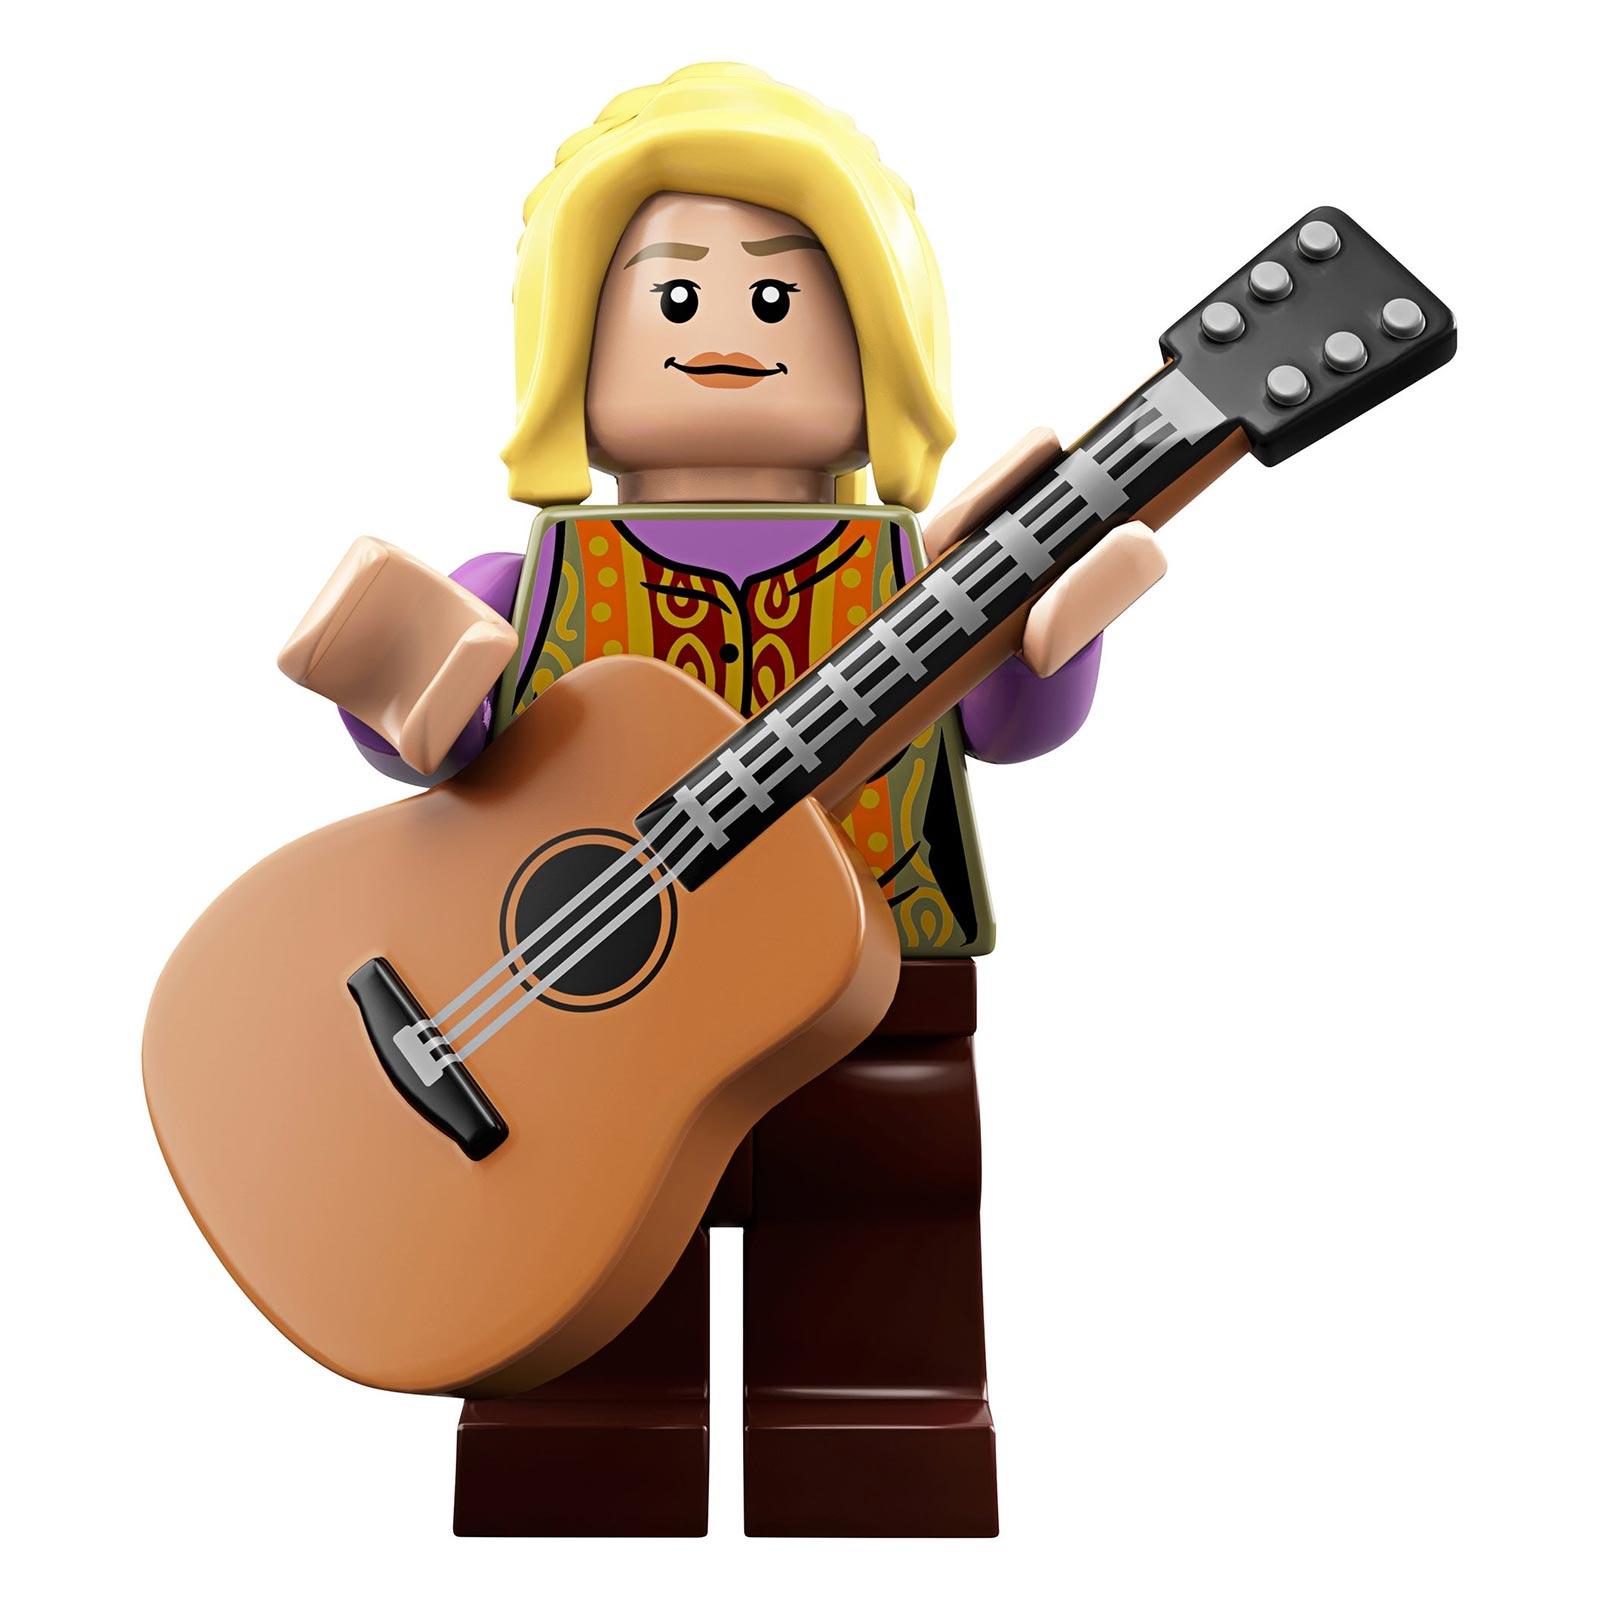 LEGO Friends Phoebe Buffay Minifigure